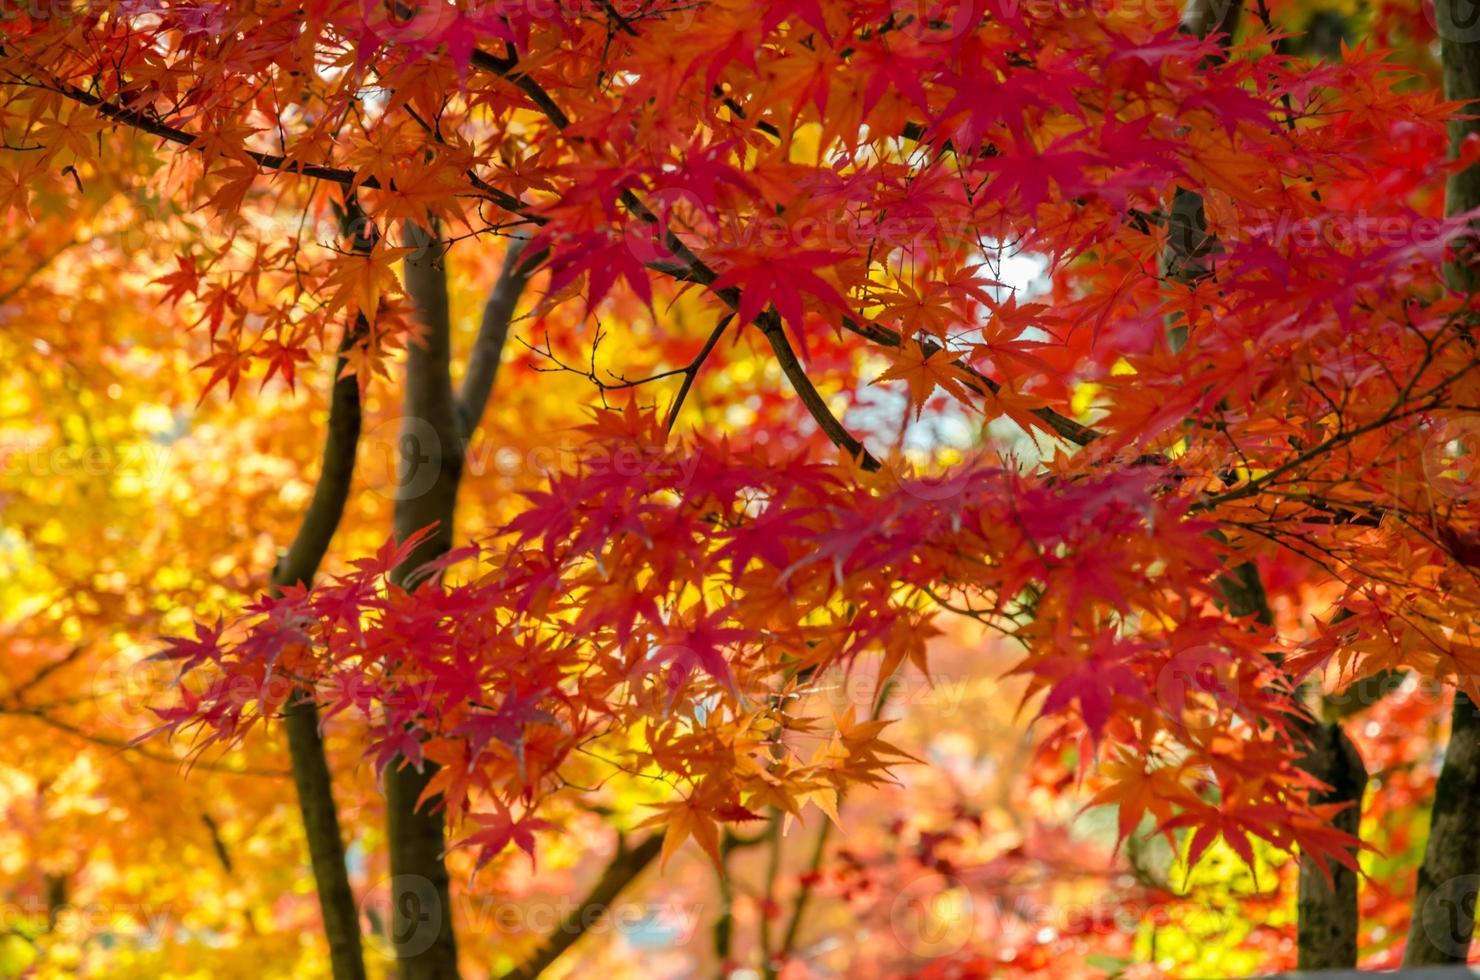 Fondo colorido de otoño, rojo, naranja y pan de oro. foto